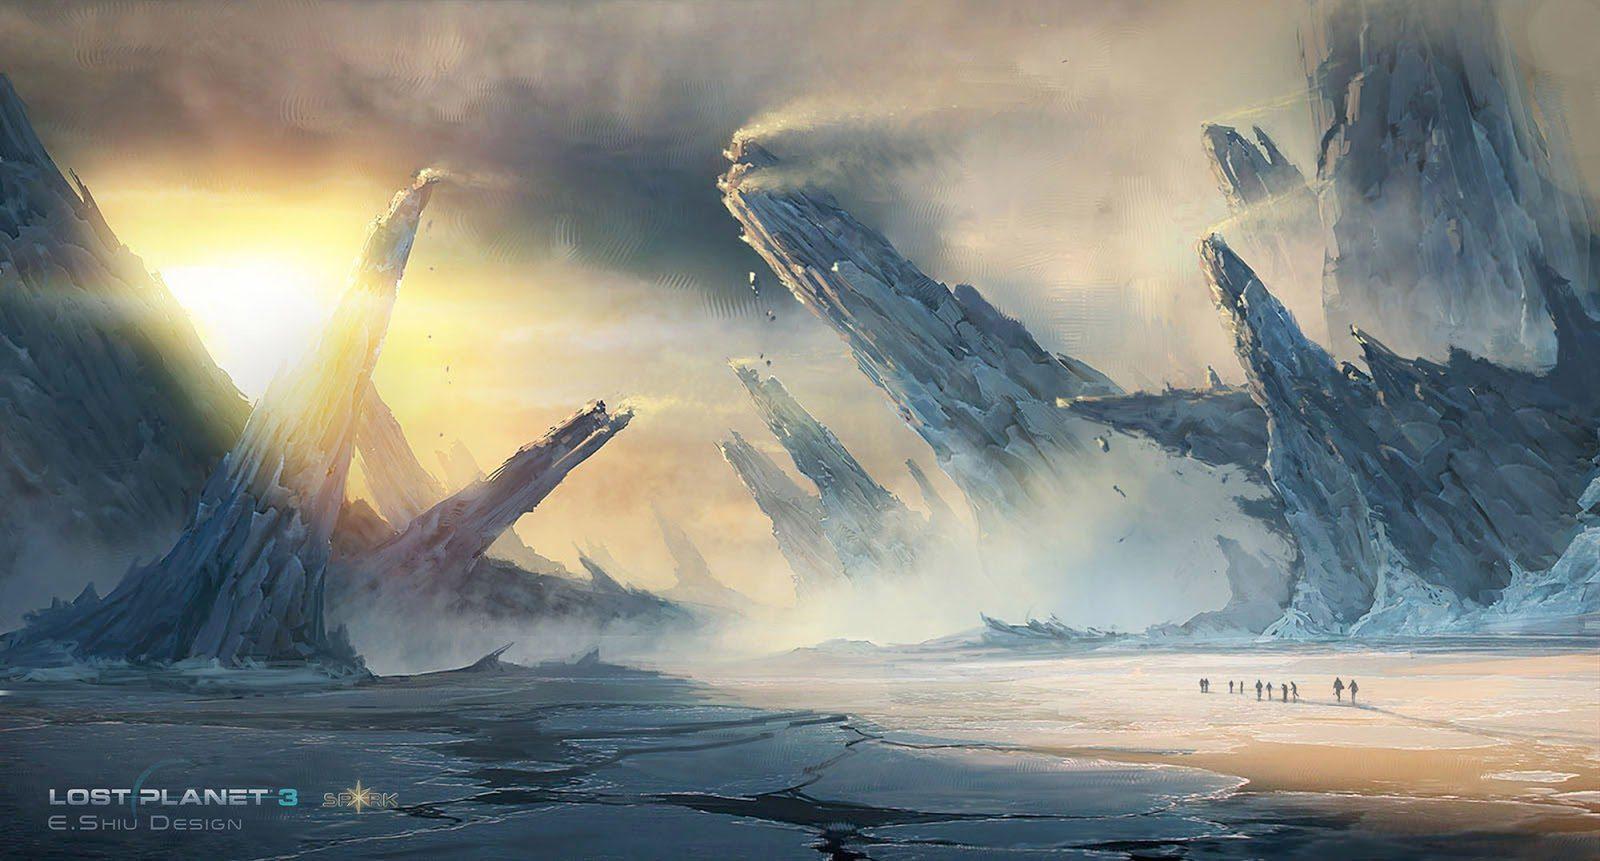 Lost Planet 3 Concept Art